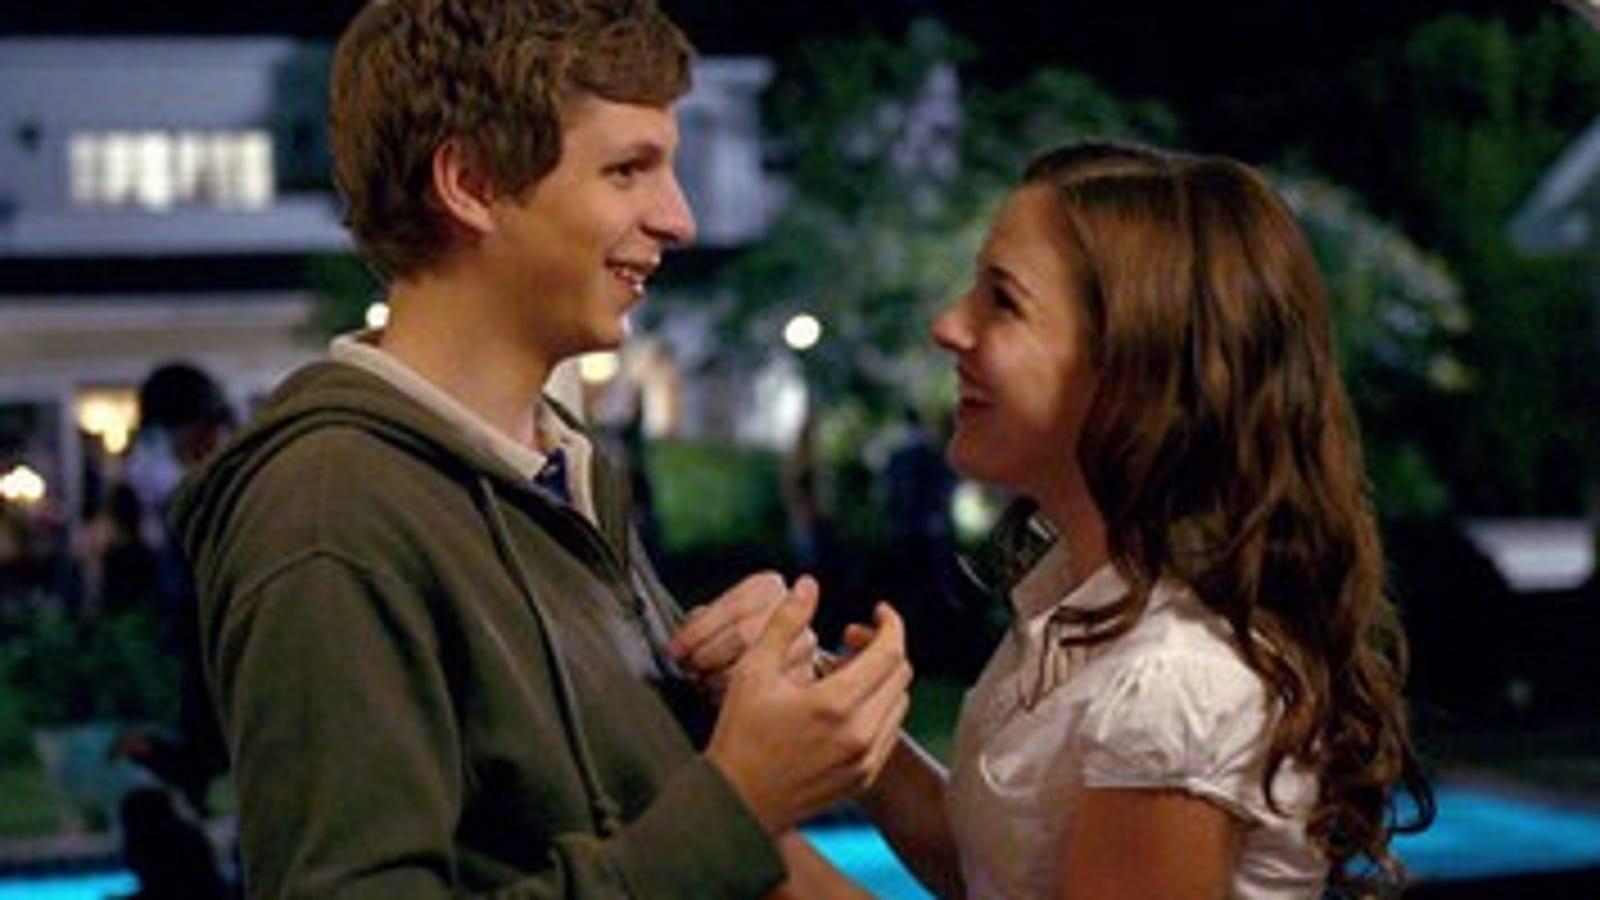 freshman senior high school dating er enid dating ron